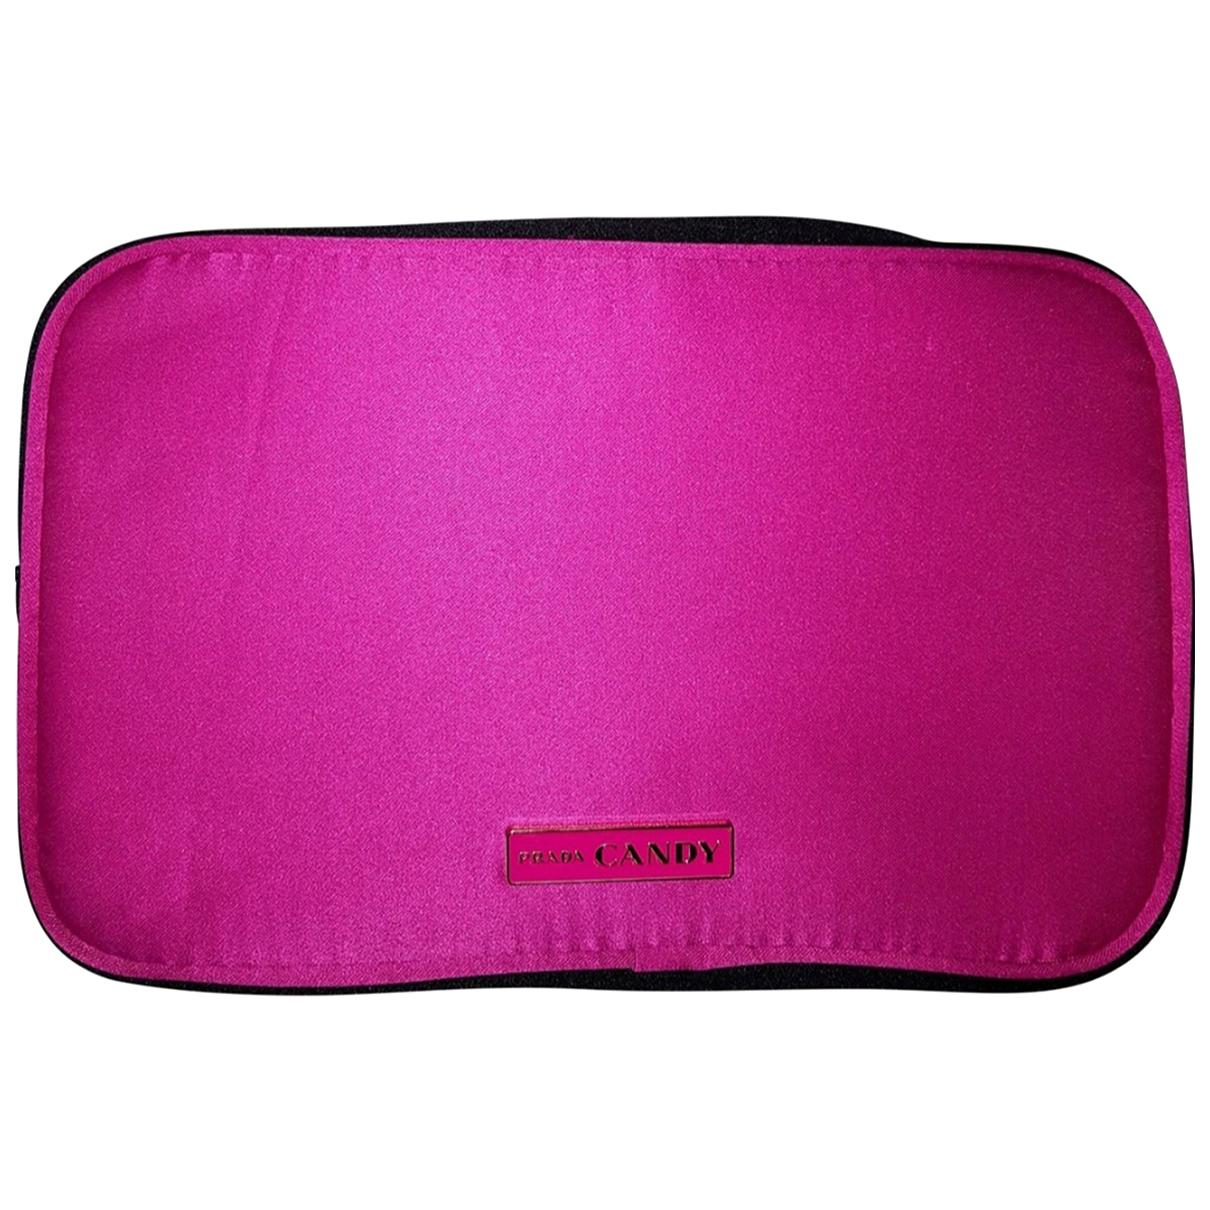 Prada N Pink Travel bag for Women N